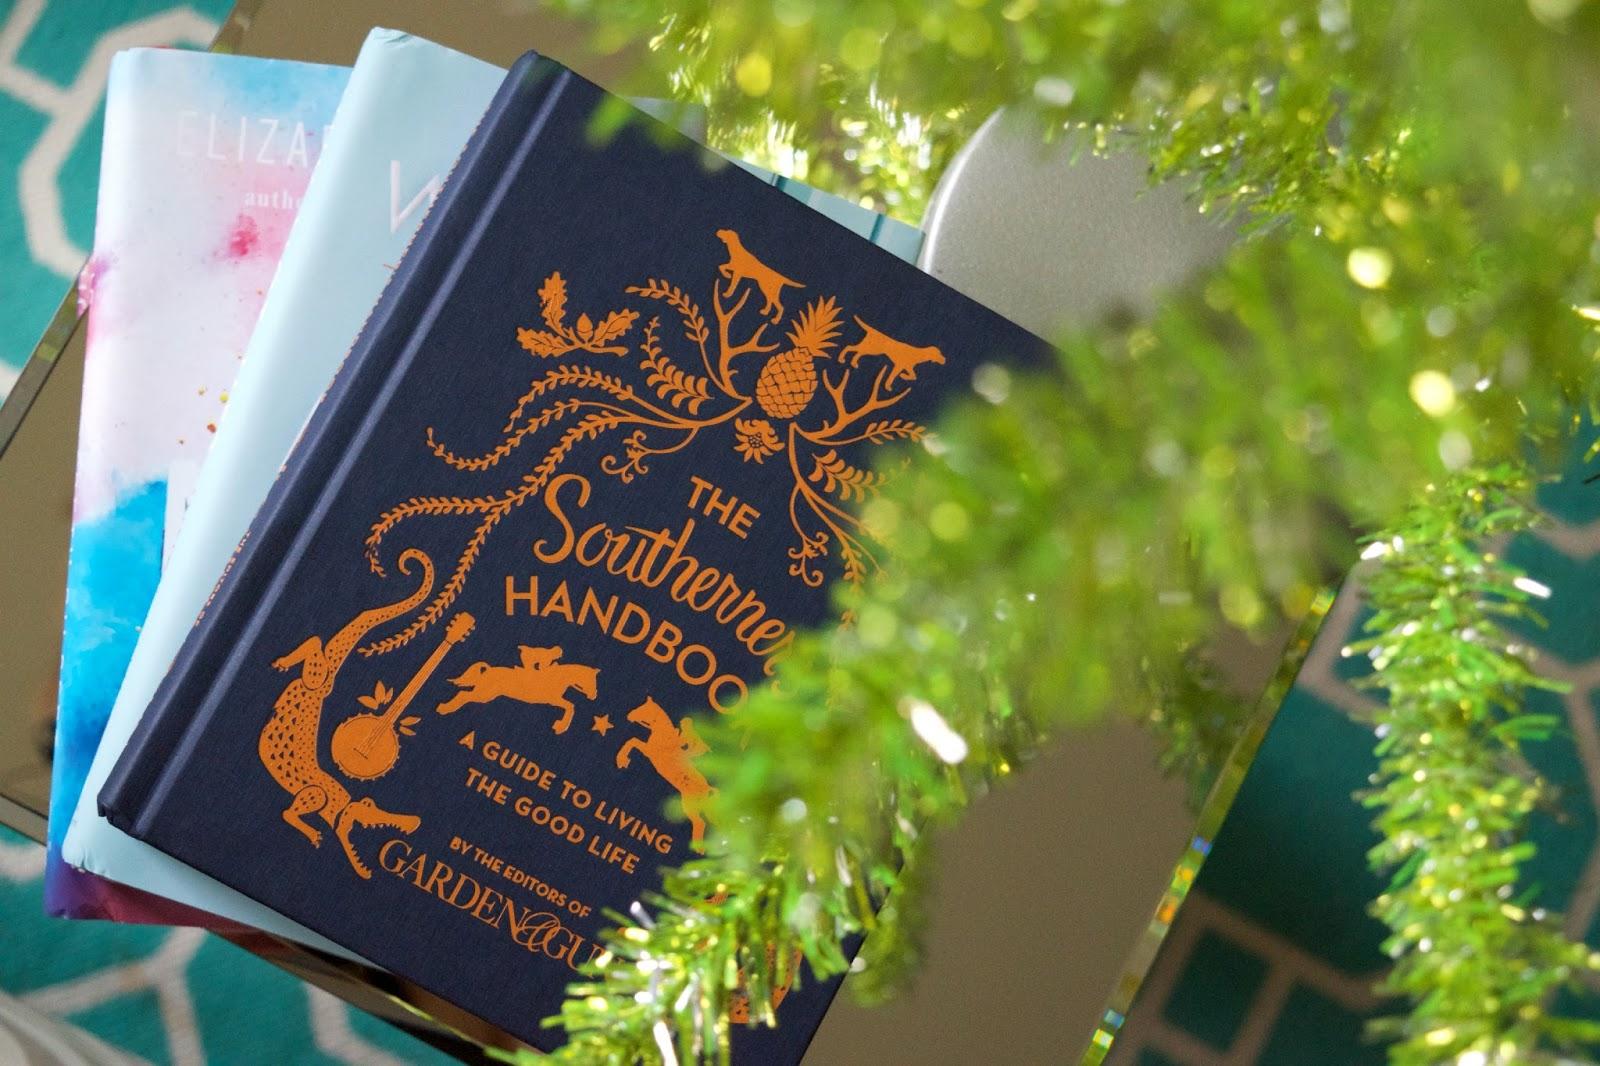 winter reading list - reading list - garden & gun southerner's handbook - southerner's handbook - big magic - why not me?